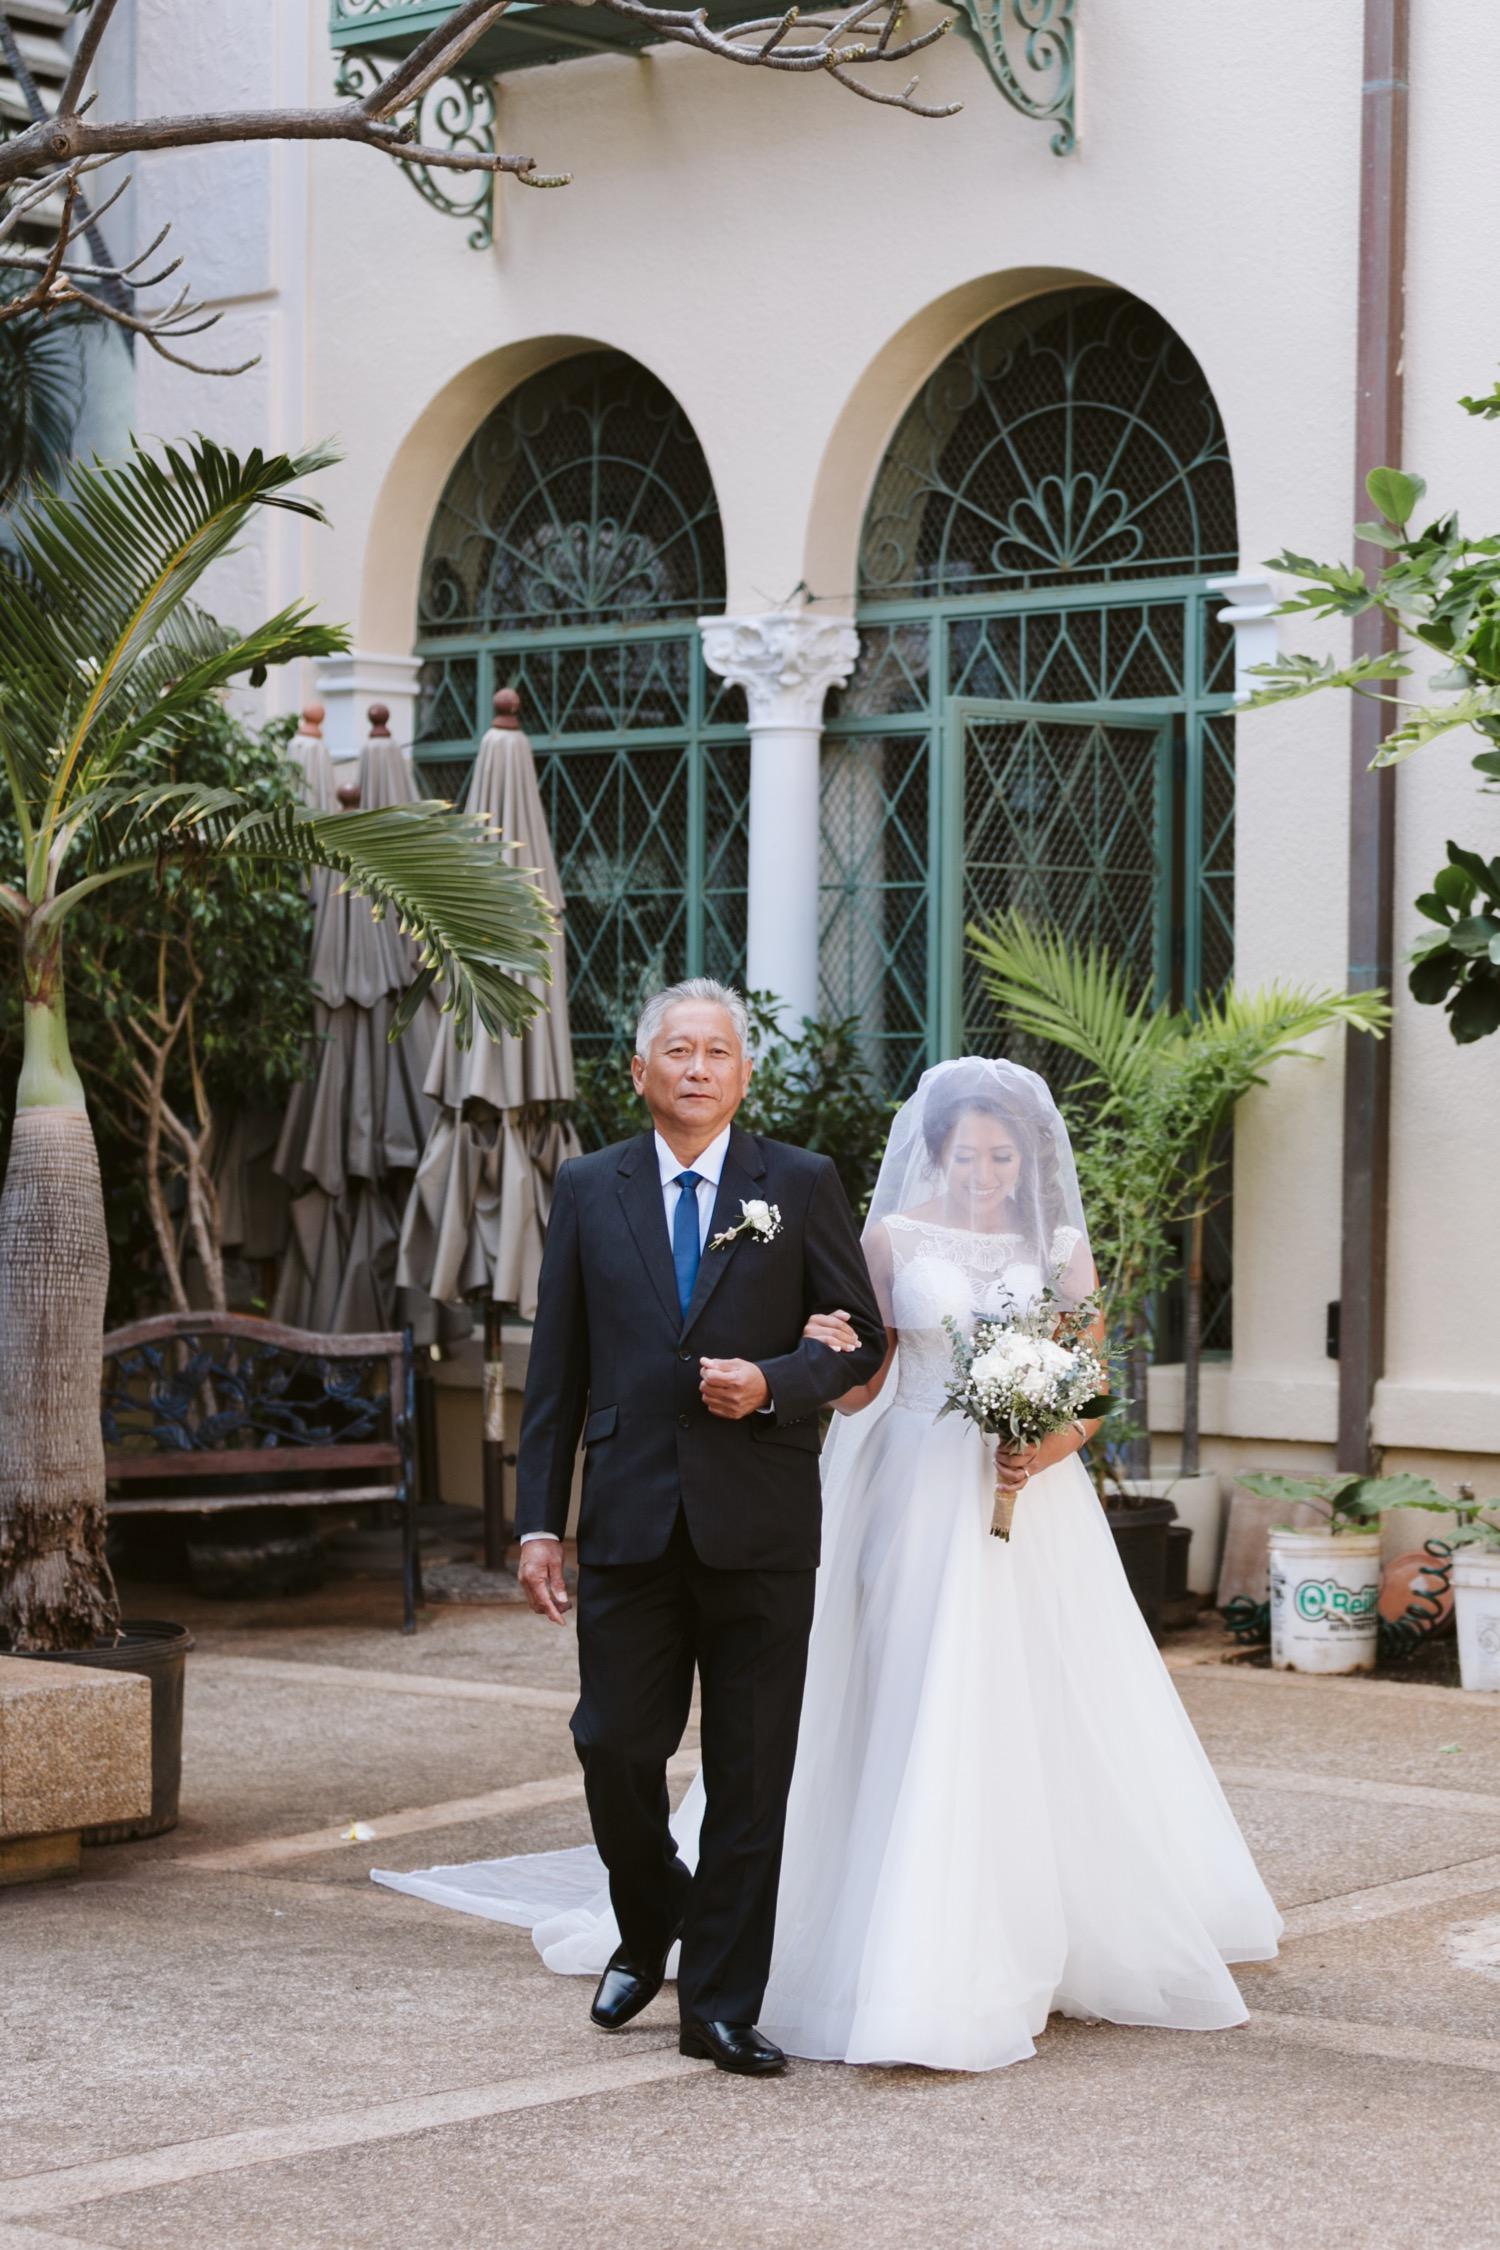 Julia_Hawaii_down_Ceremony_Bride_Honolulu_Cafe_Wedding_Walking_dad_aisle.jpg